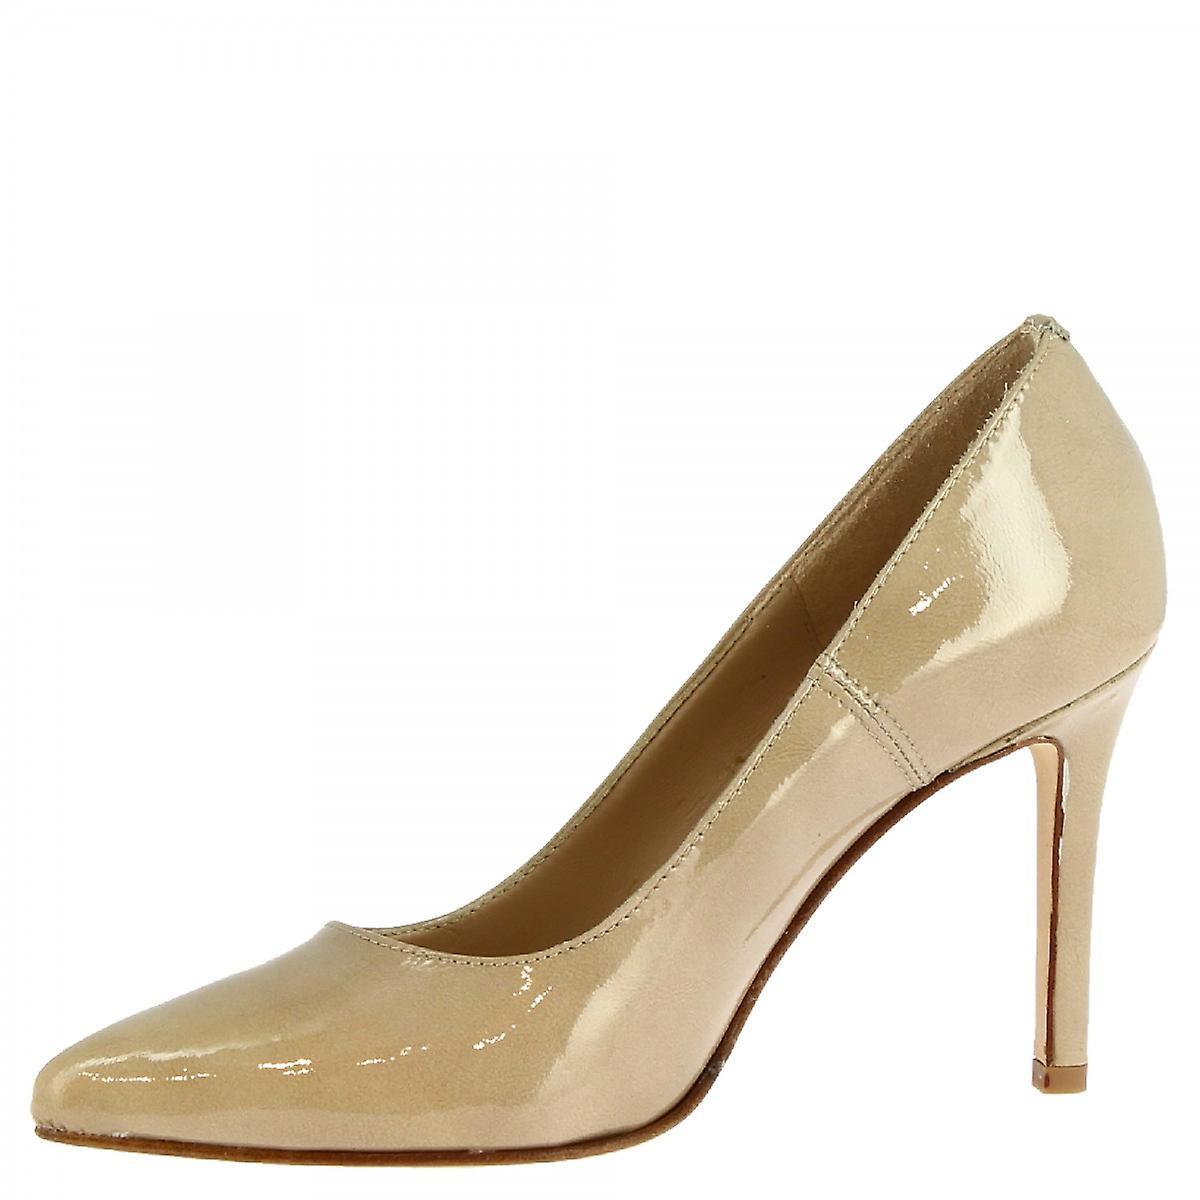 Leonardo Shoes Women's handmade high heels pumps shoes in beige shiny leather